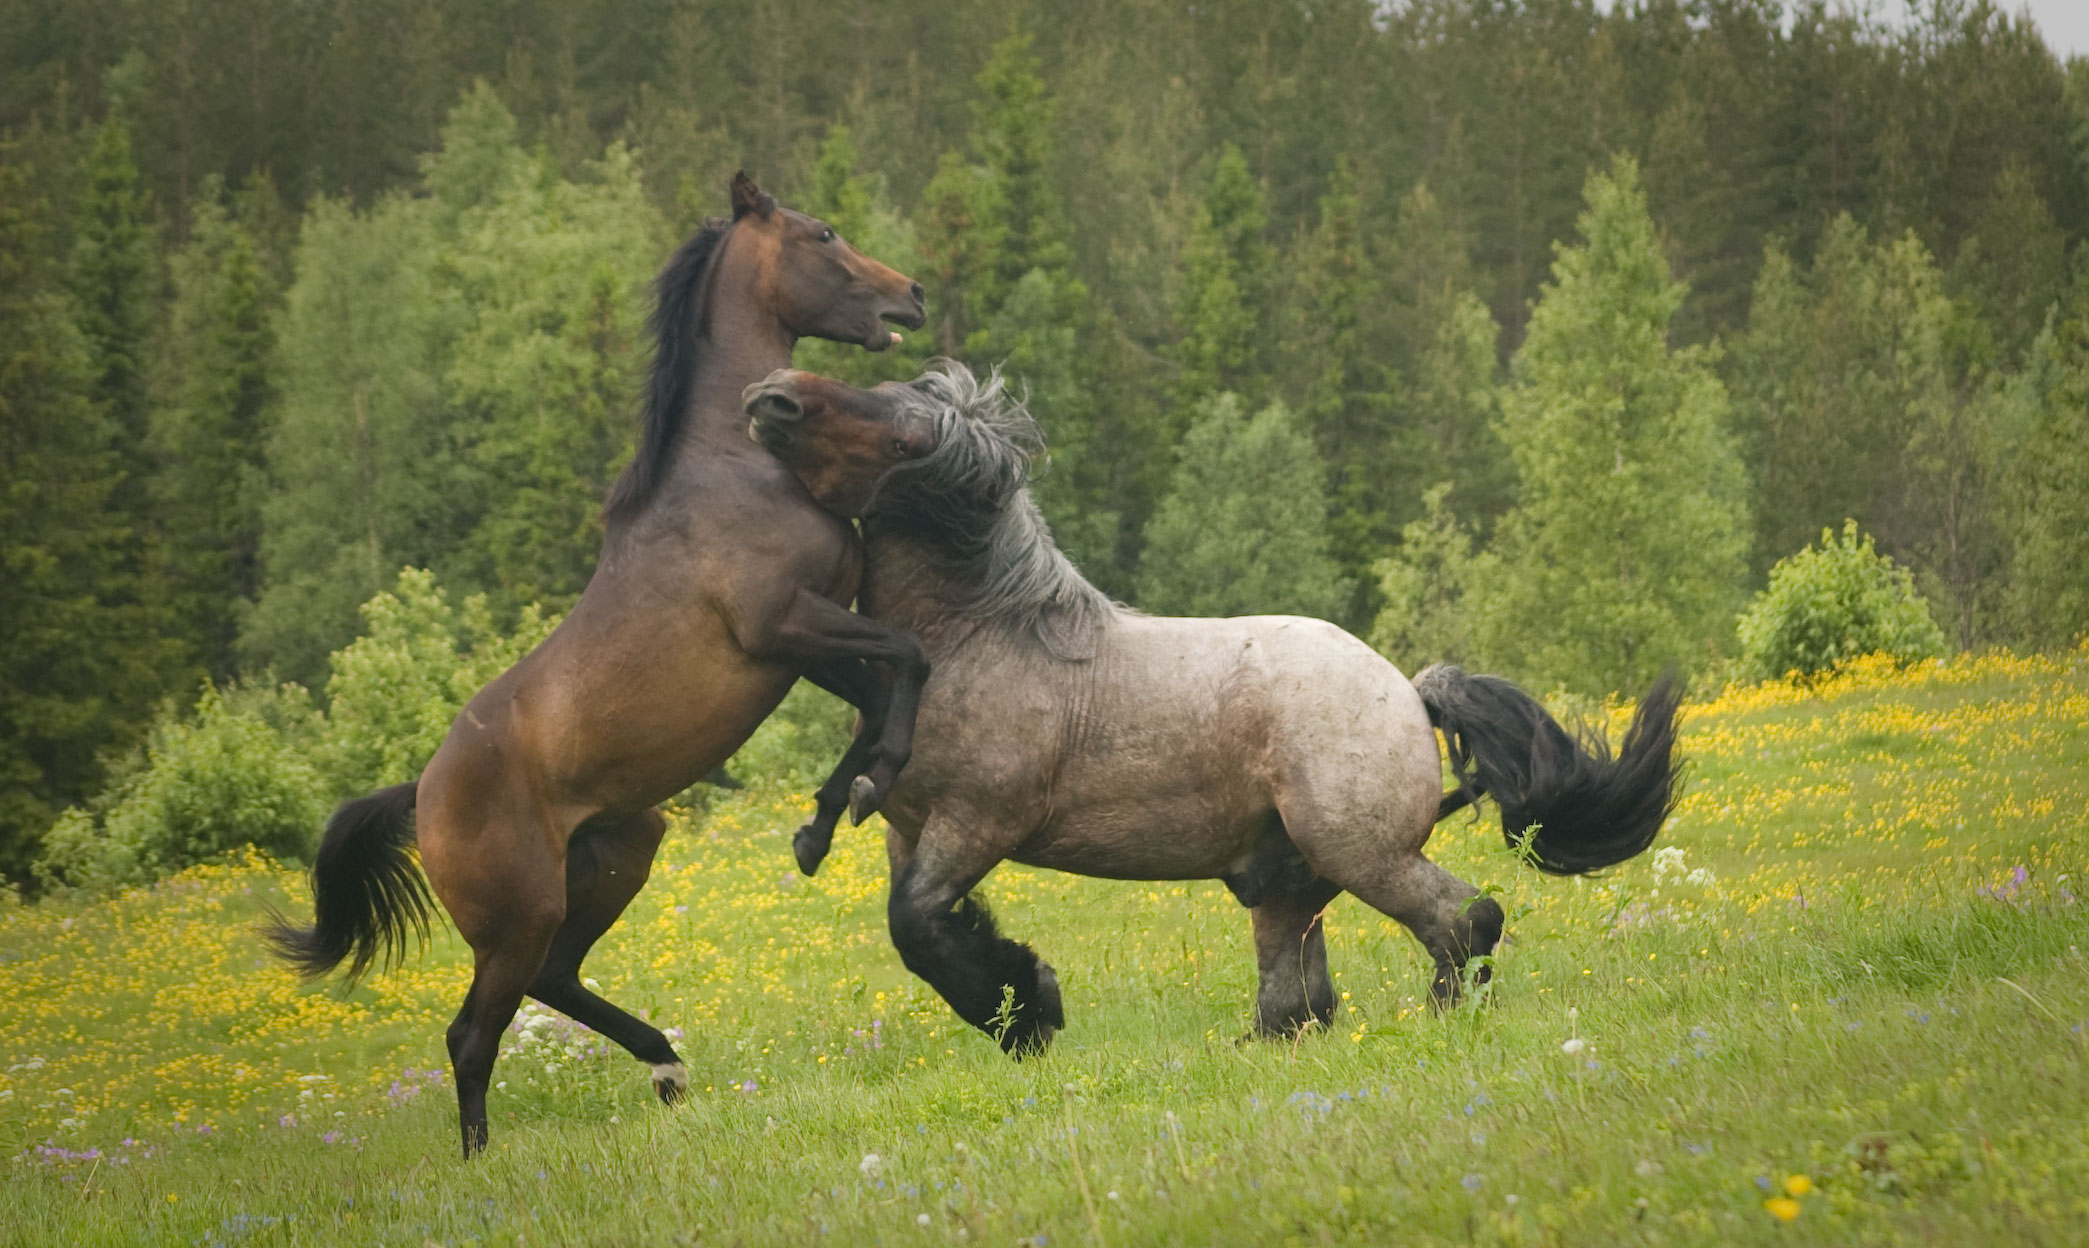 Horse_fight_by_Emeeeliiie.jpg